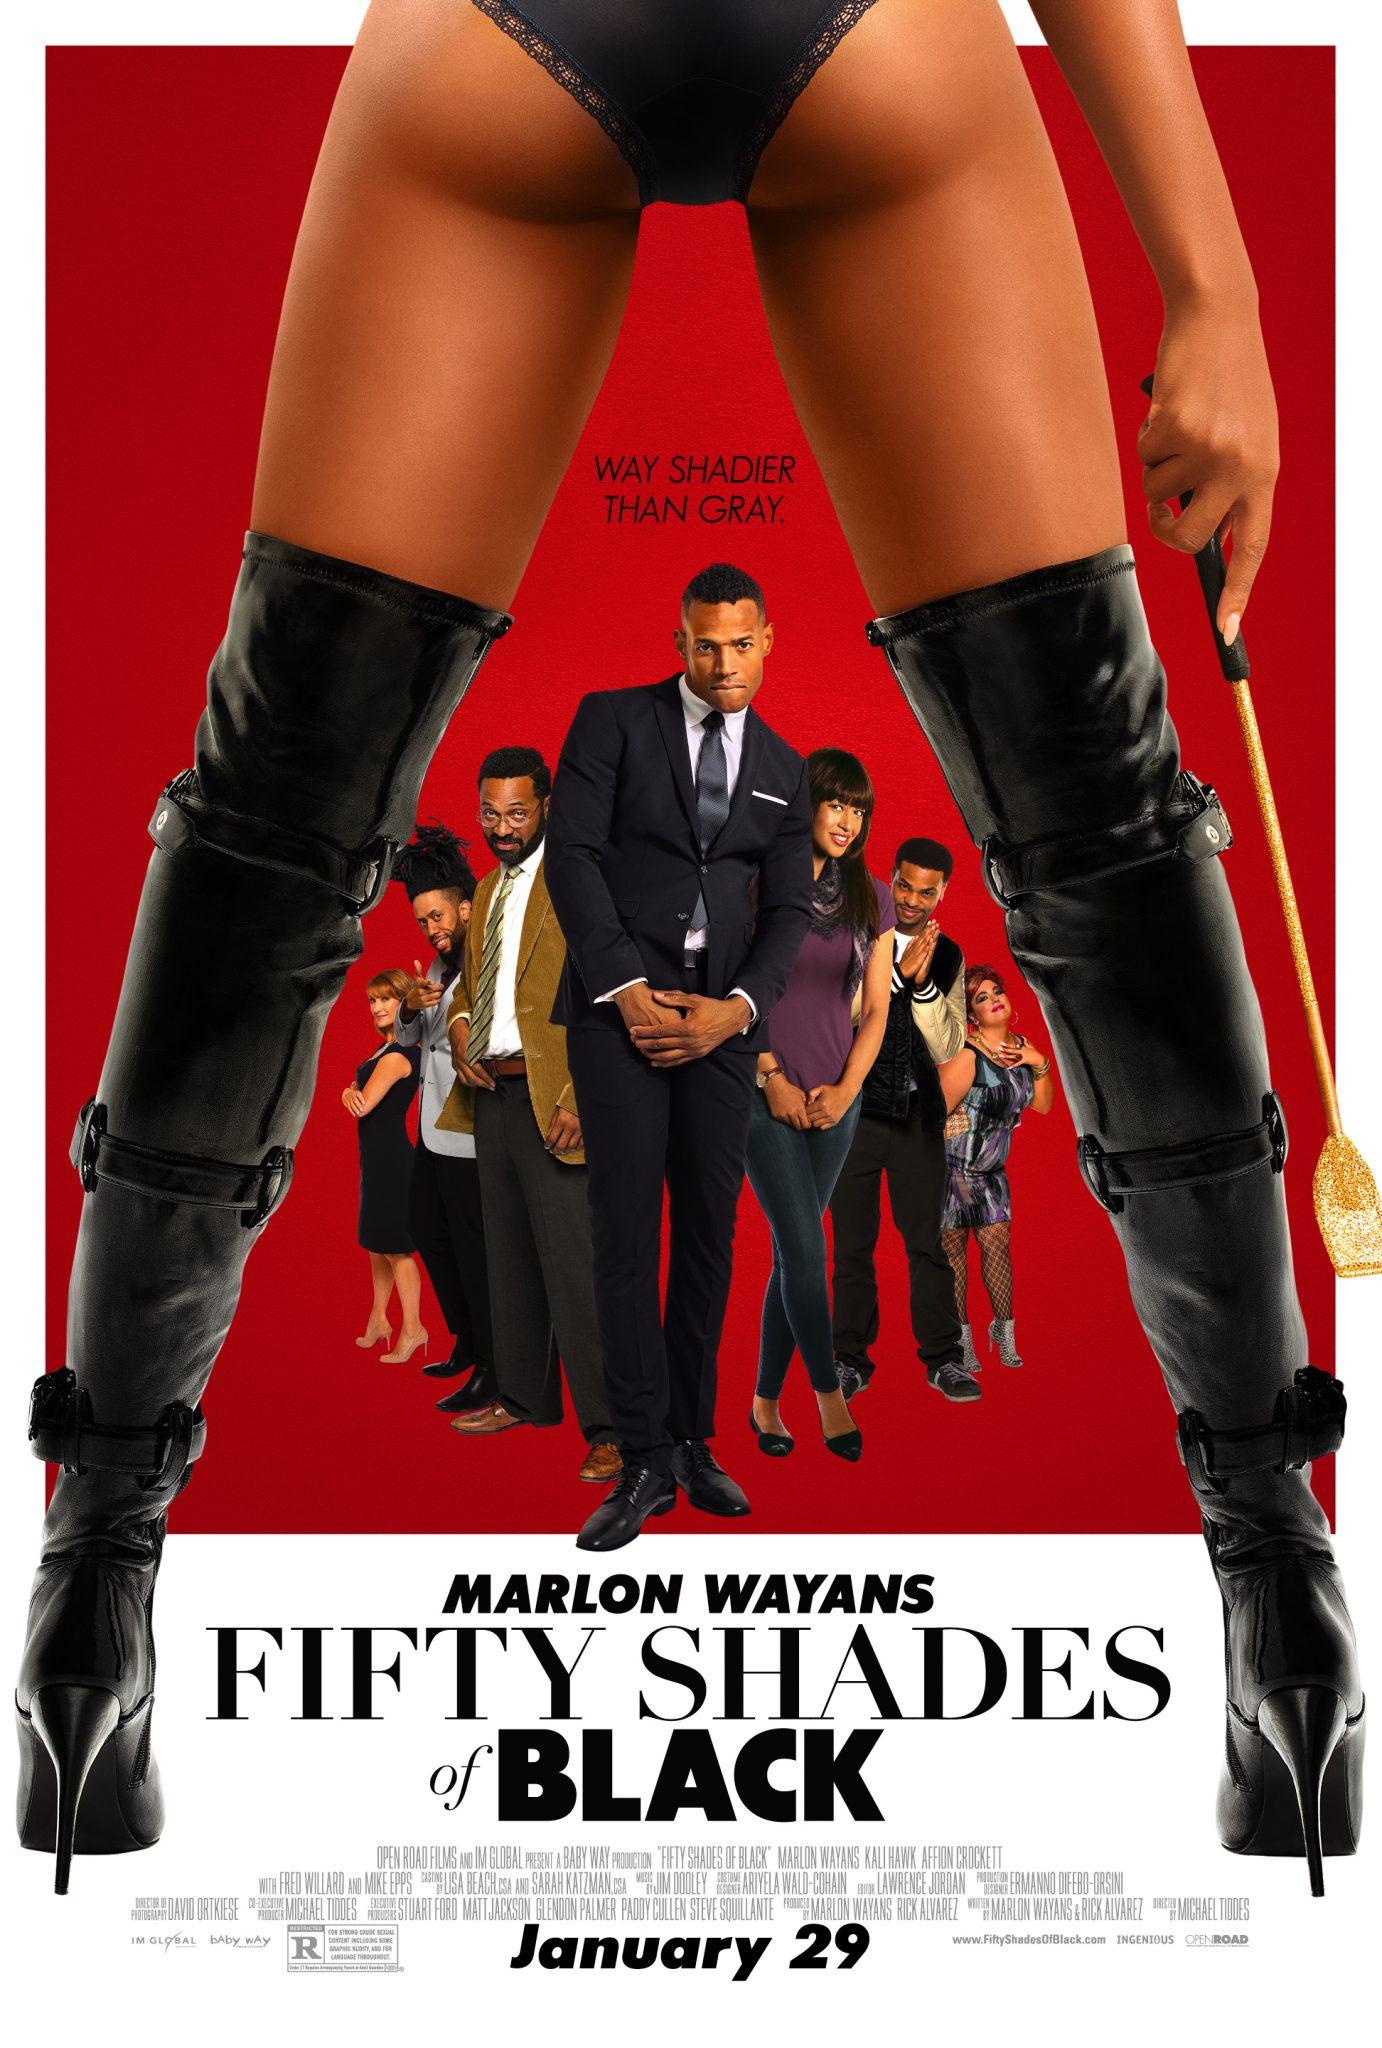 New Movie: 'Fifty Shades of Black' Starring Marlon Wayans